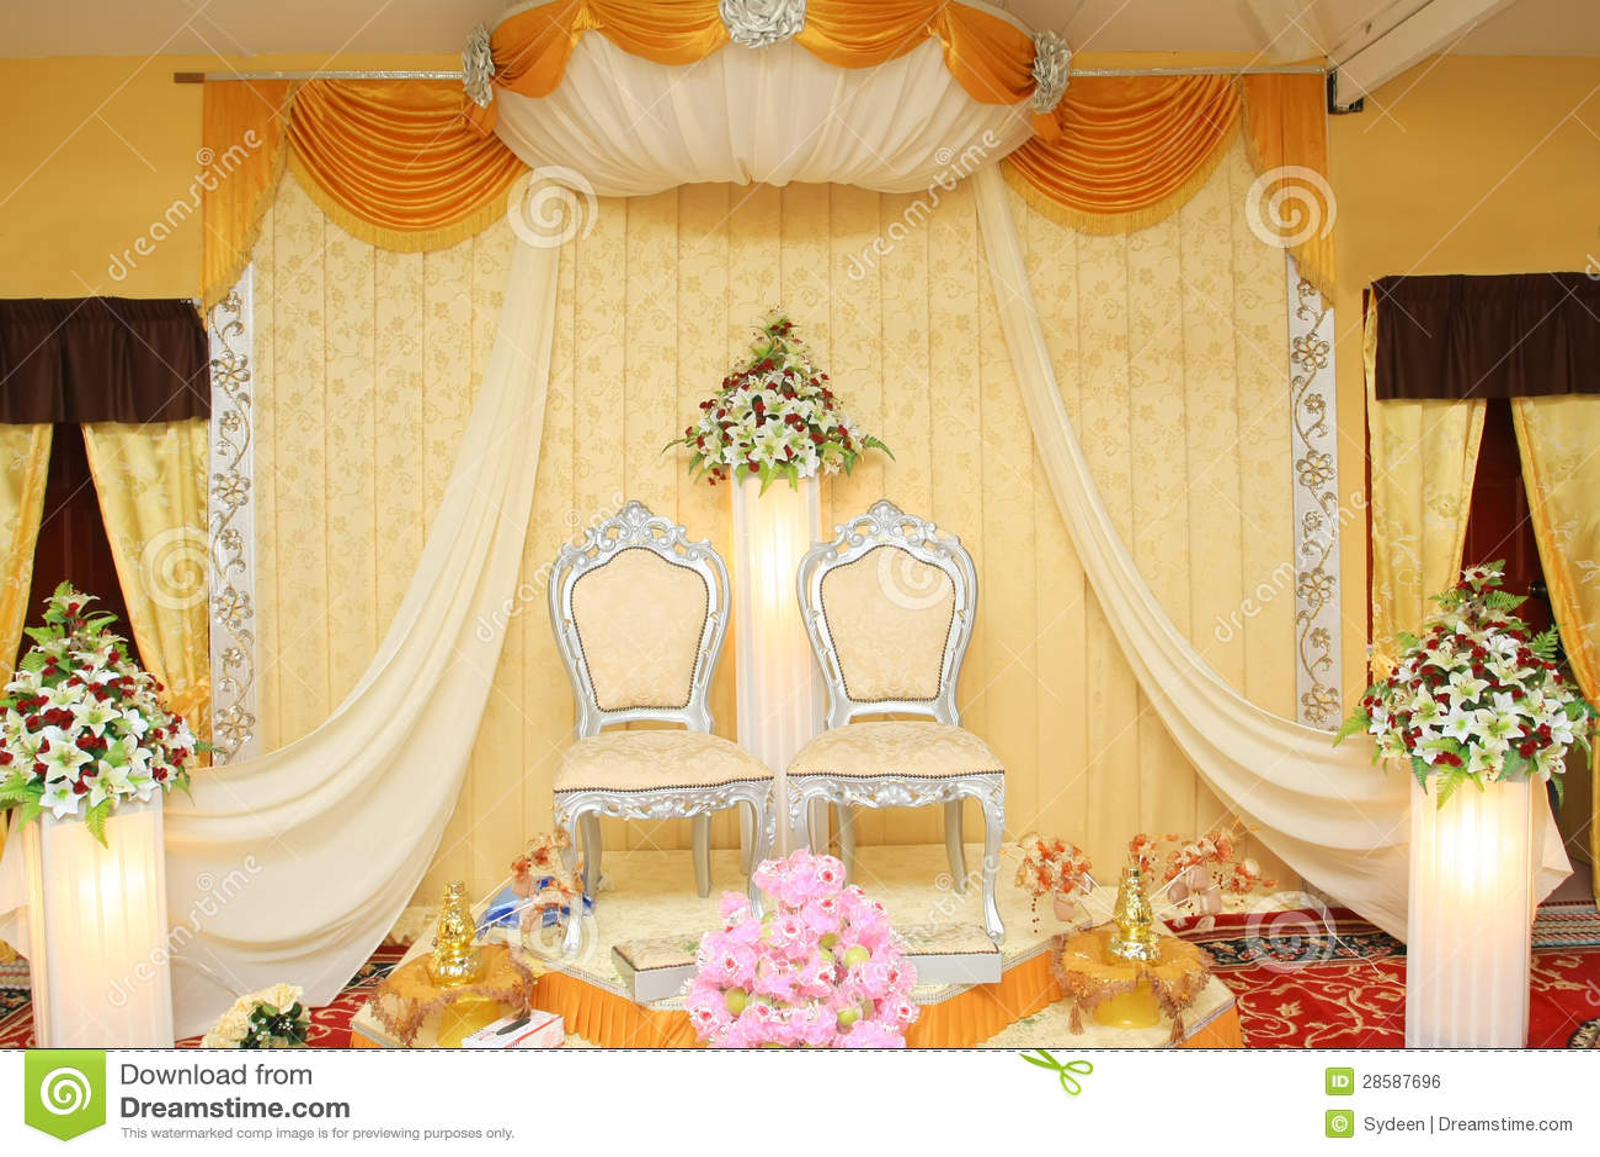 Malay Wedding Stage Stock Photo Image Of Light Flowers